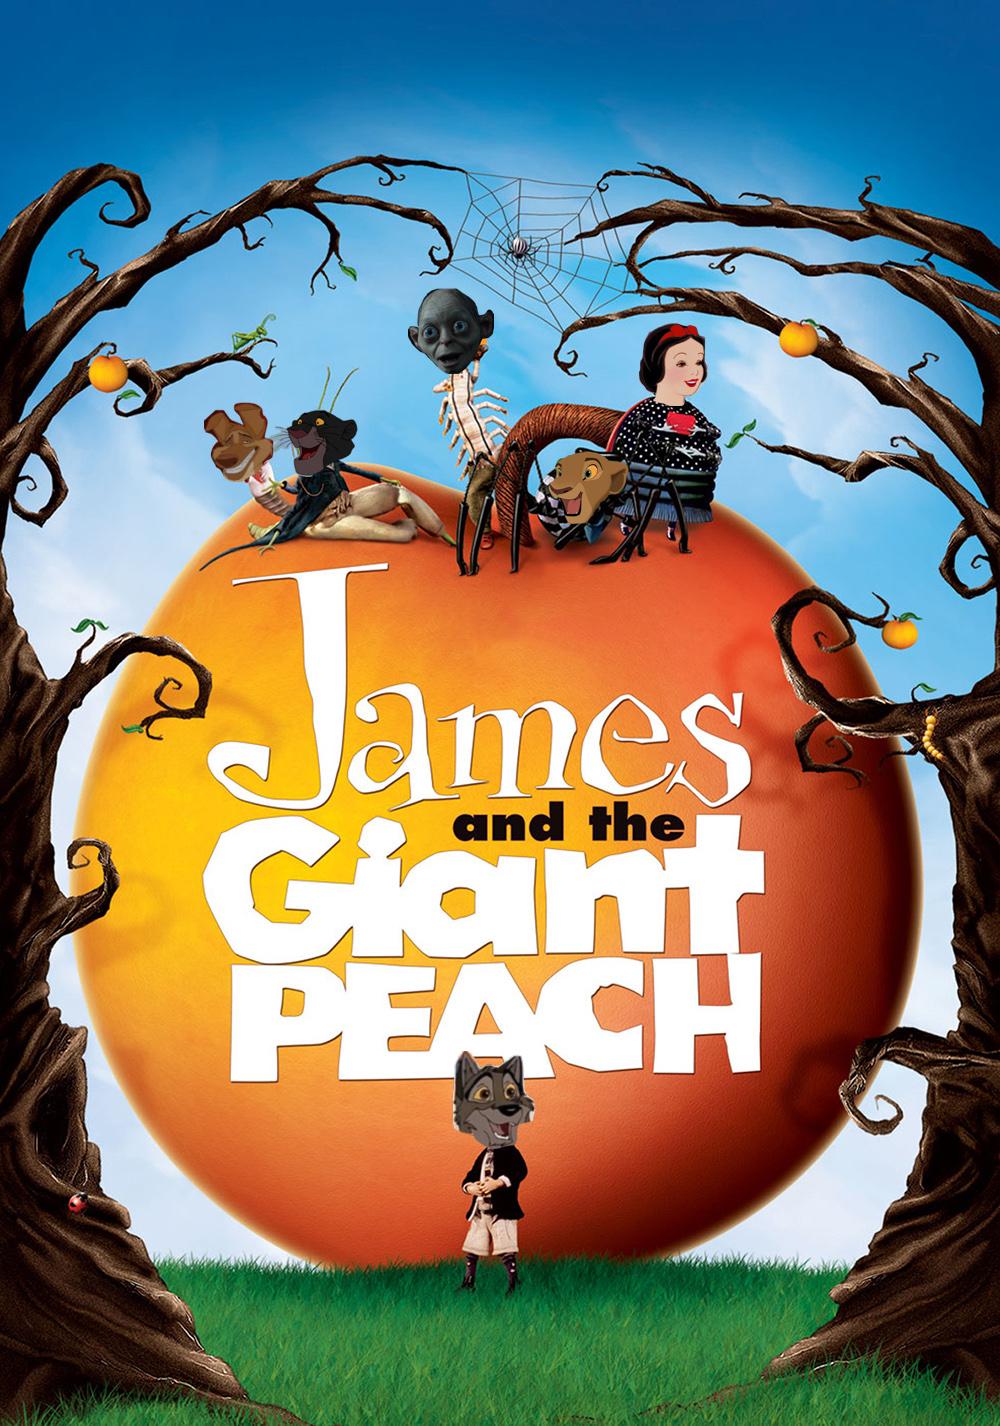 Luke/Balto and the Giant Peach